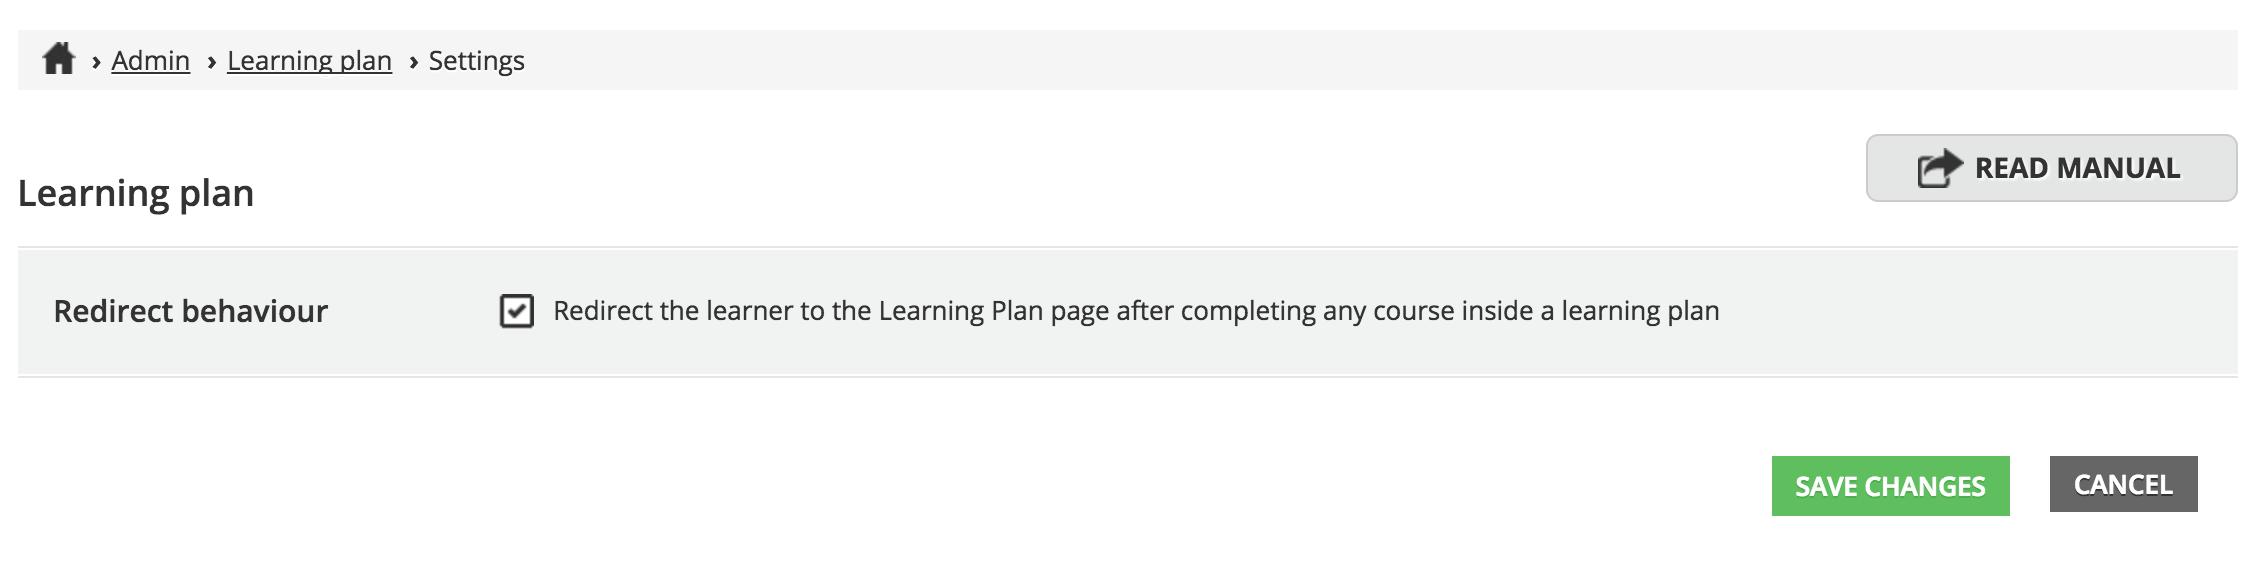 Redirect - Learning plan